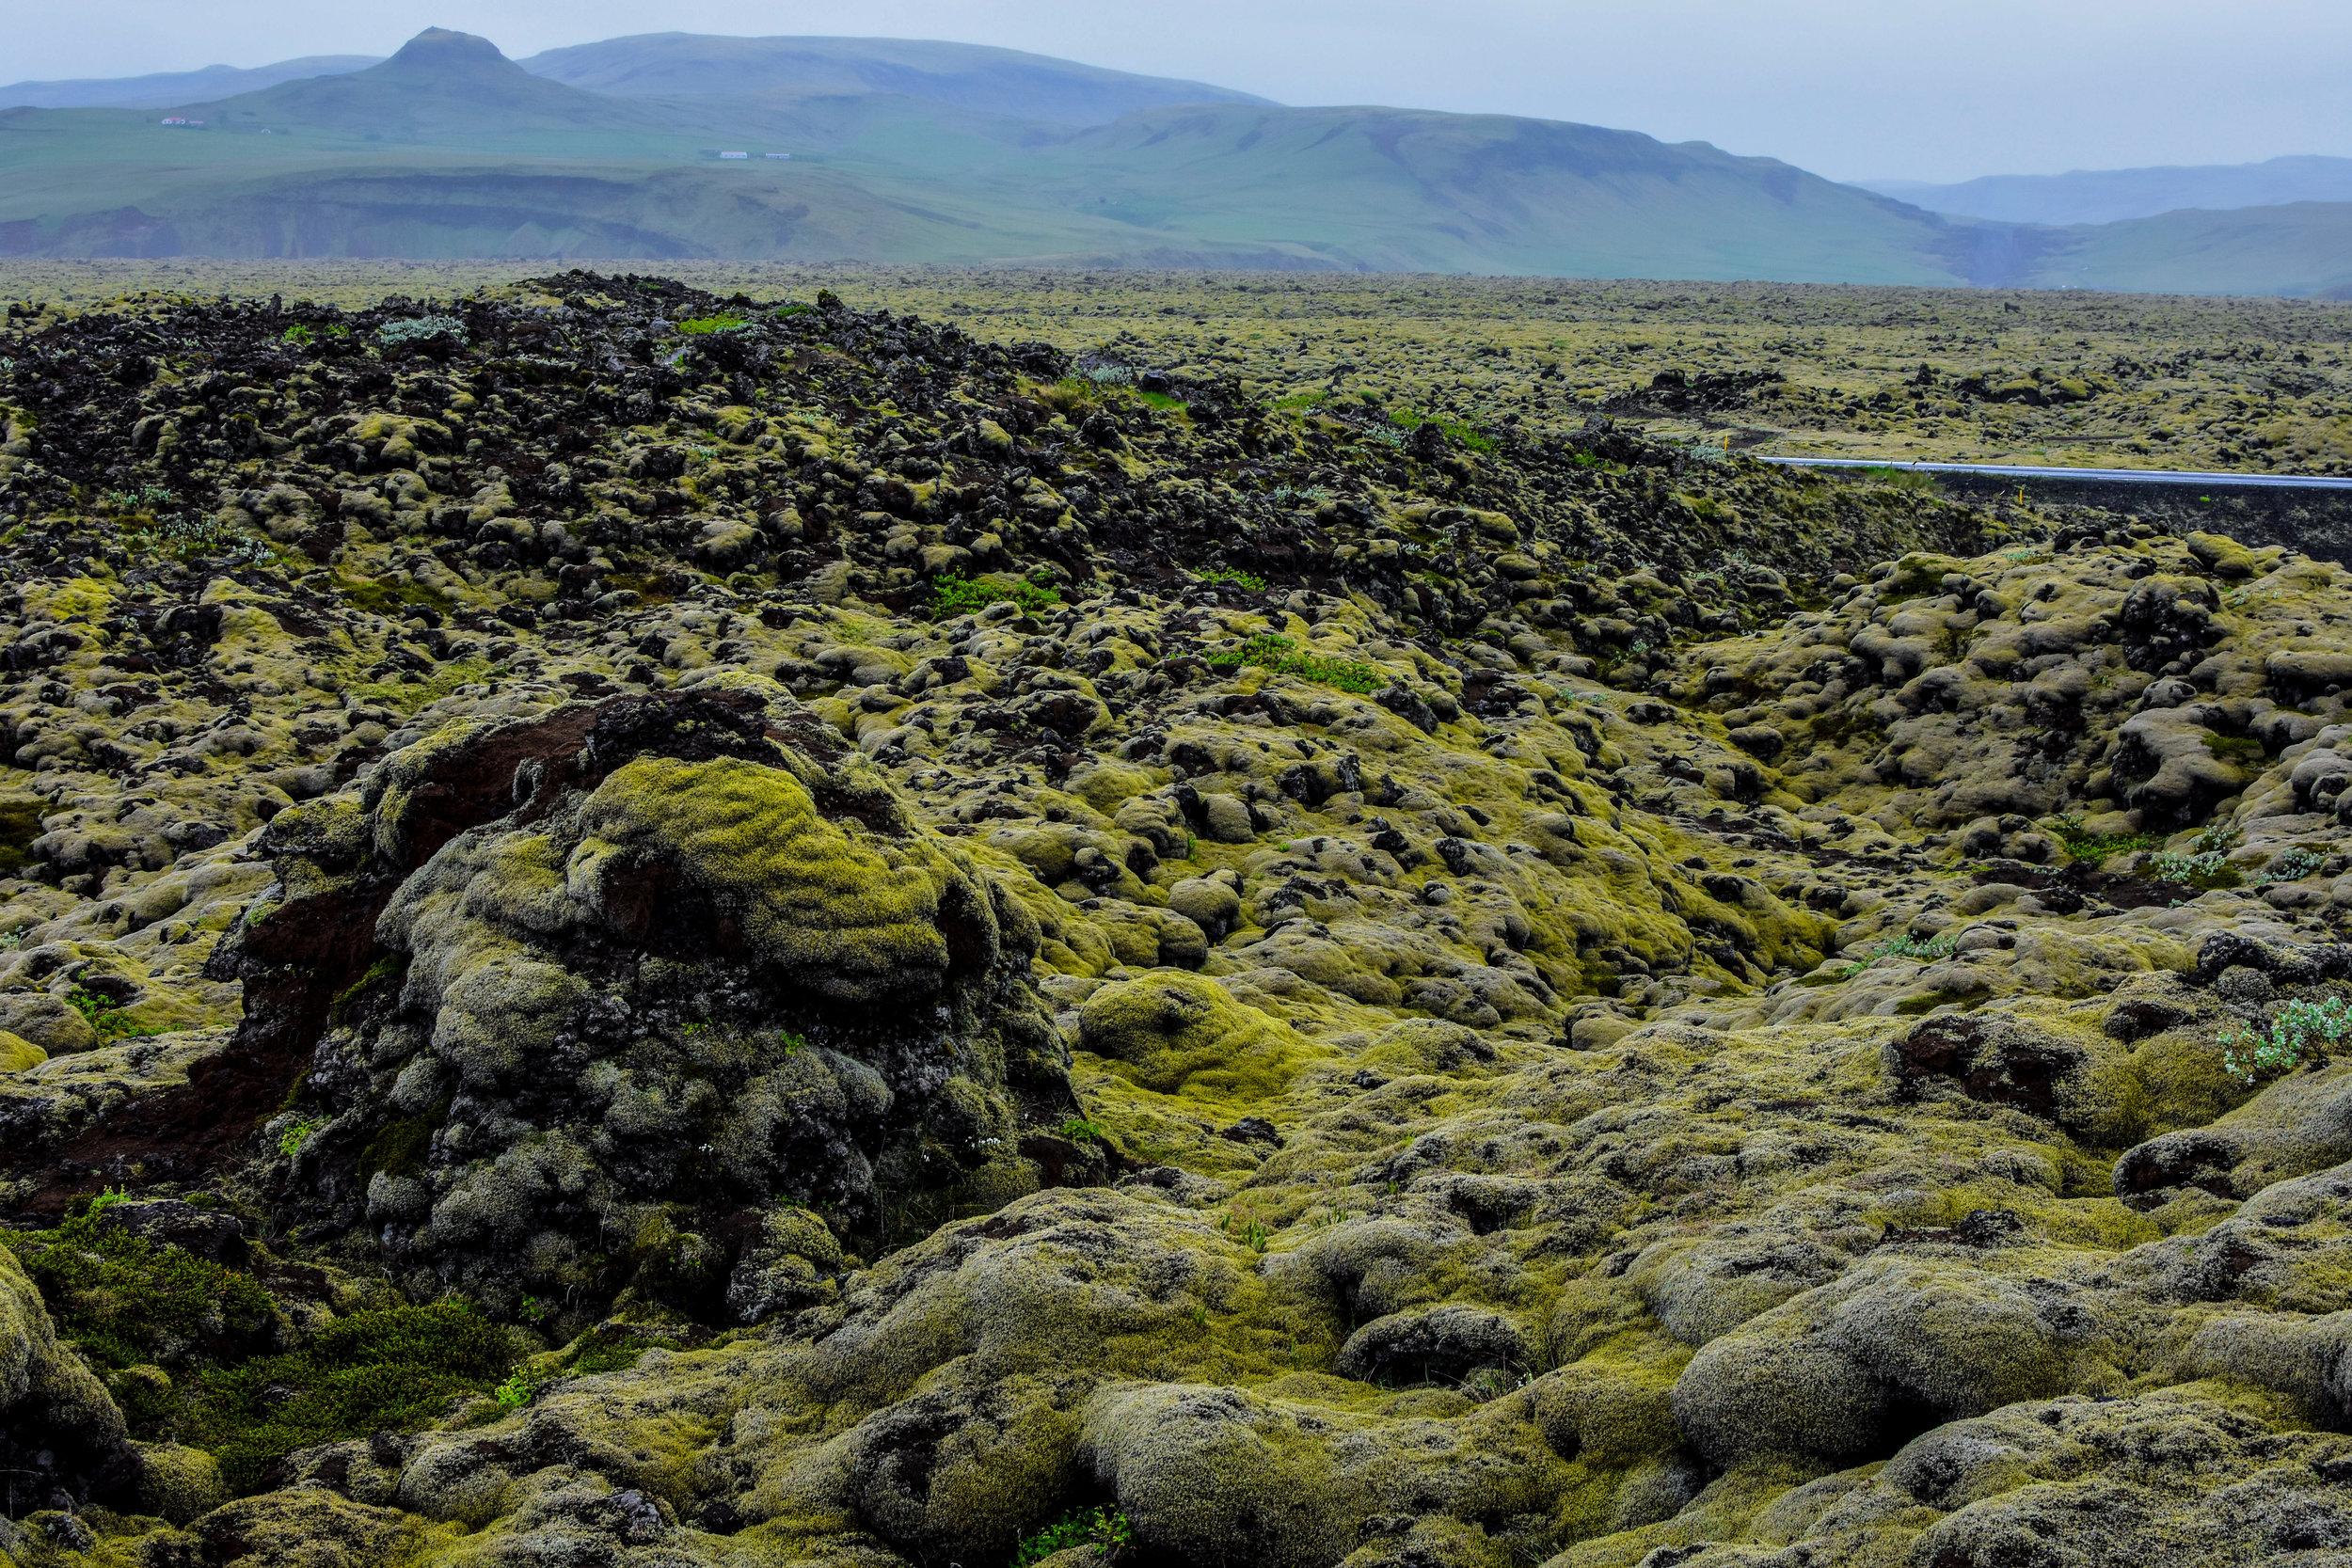 Eldhraun - Largest Lava Field in the World